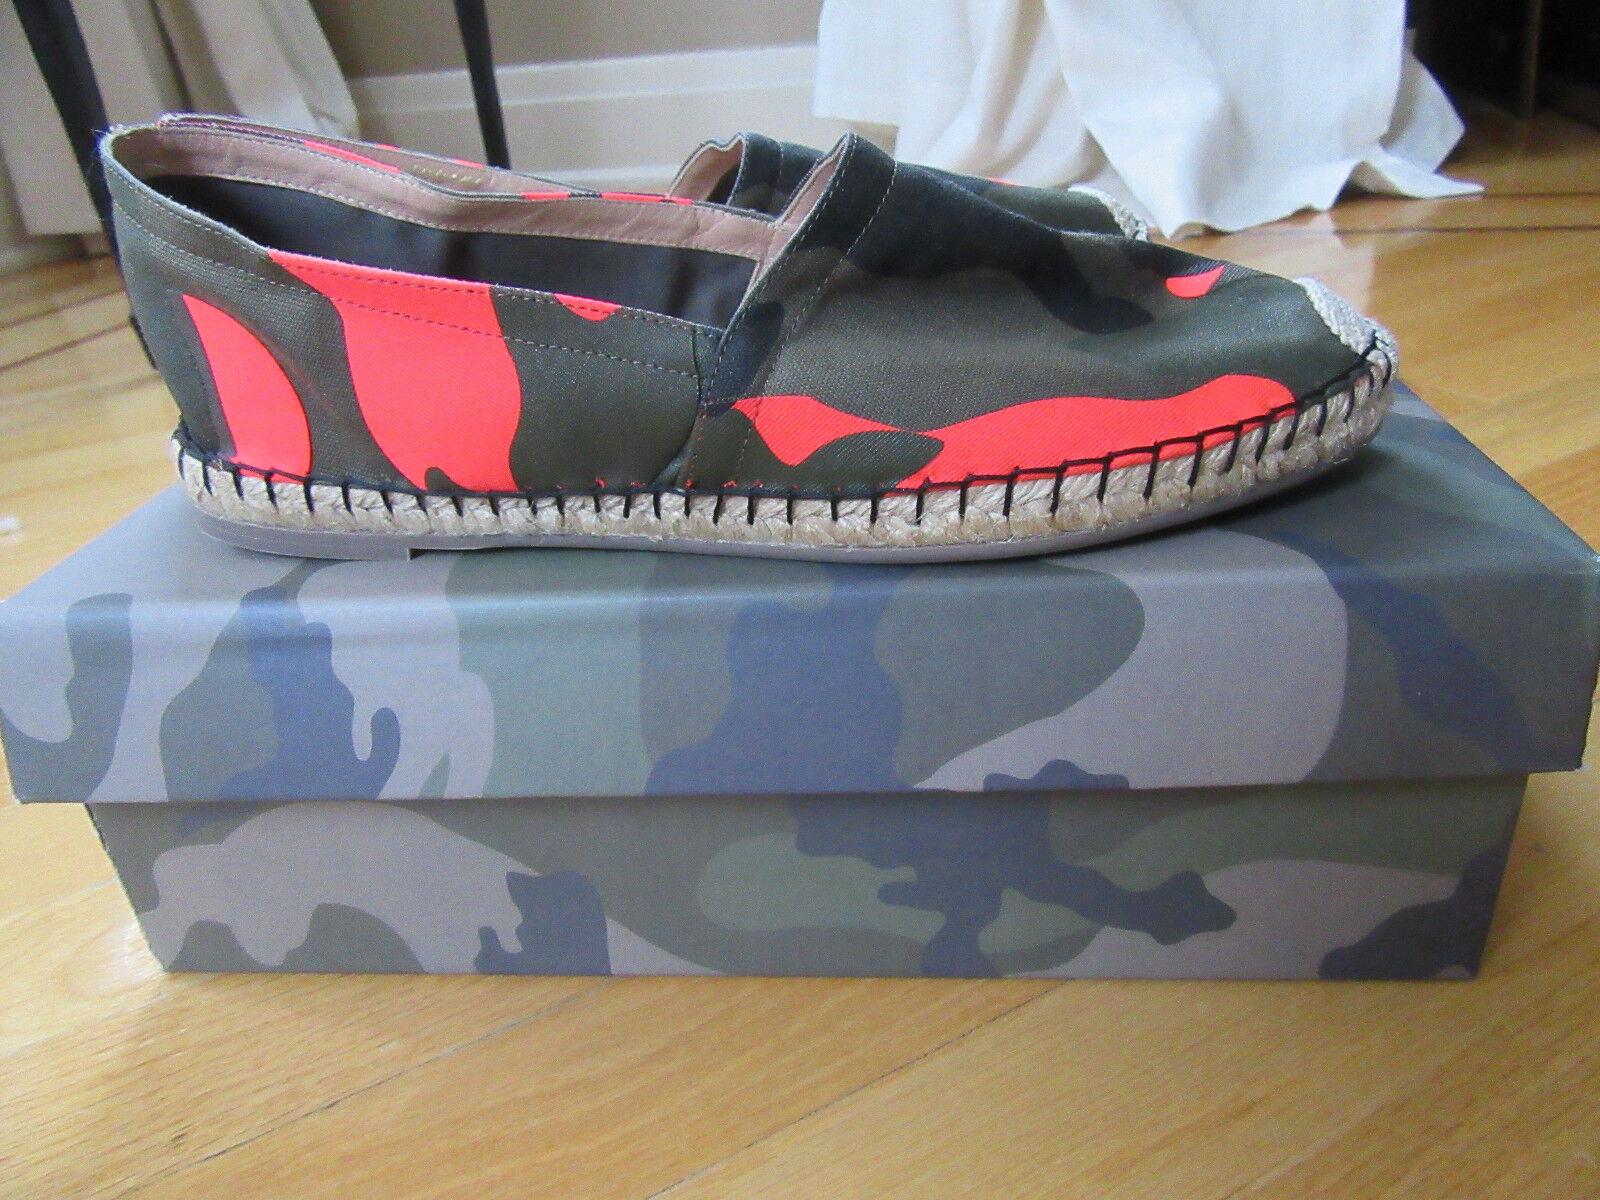 NiB Valentino Valentino Valentino Pink Camouflage Print Espadrille Flat Slip on shoes Size 39, US 9 62c291